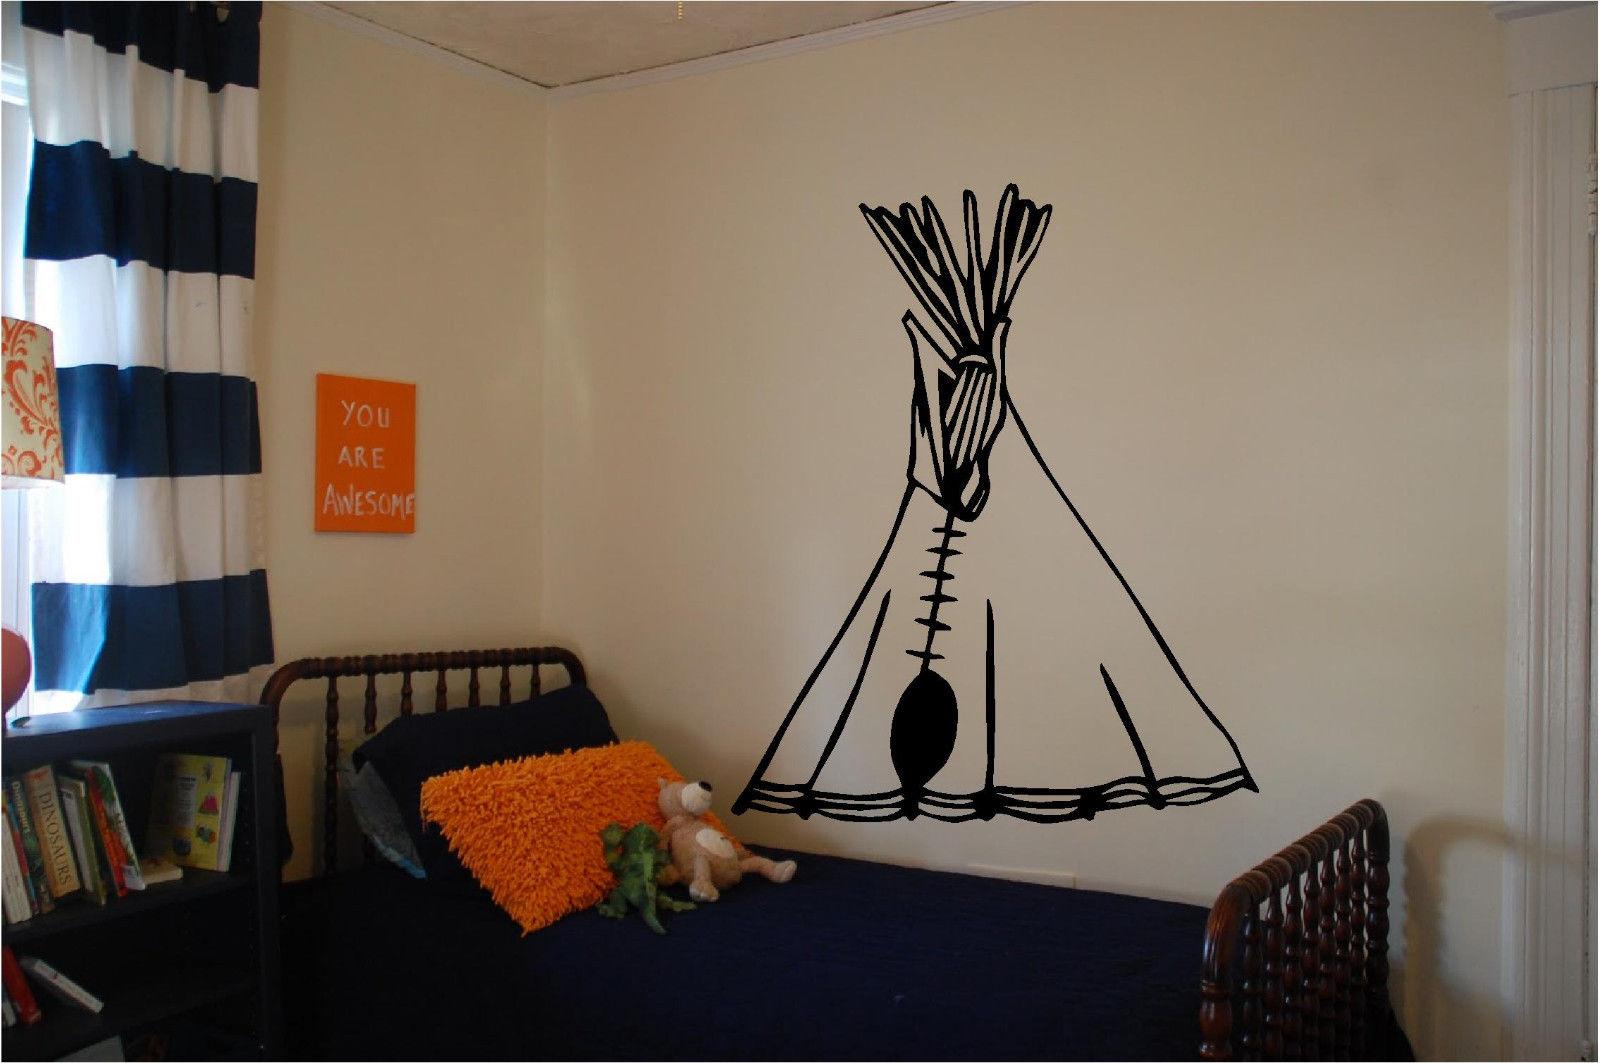 Tee Pee Wall Sticker Wall Kids Room Art Decor